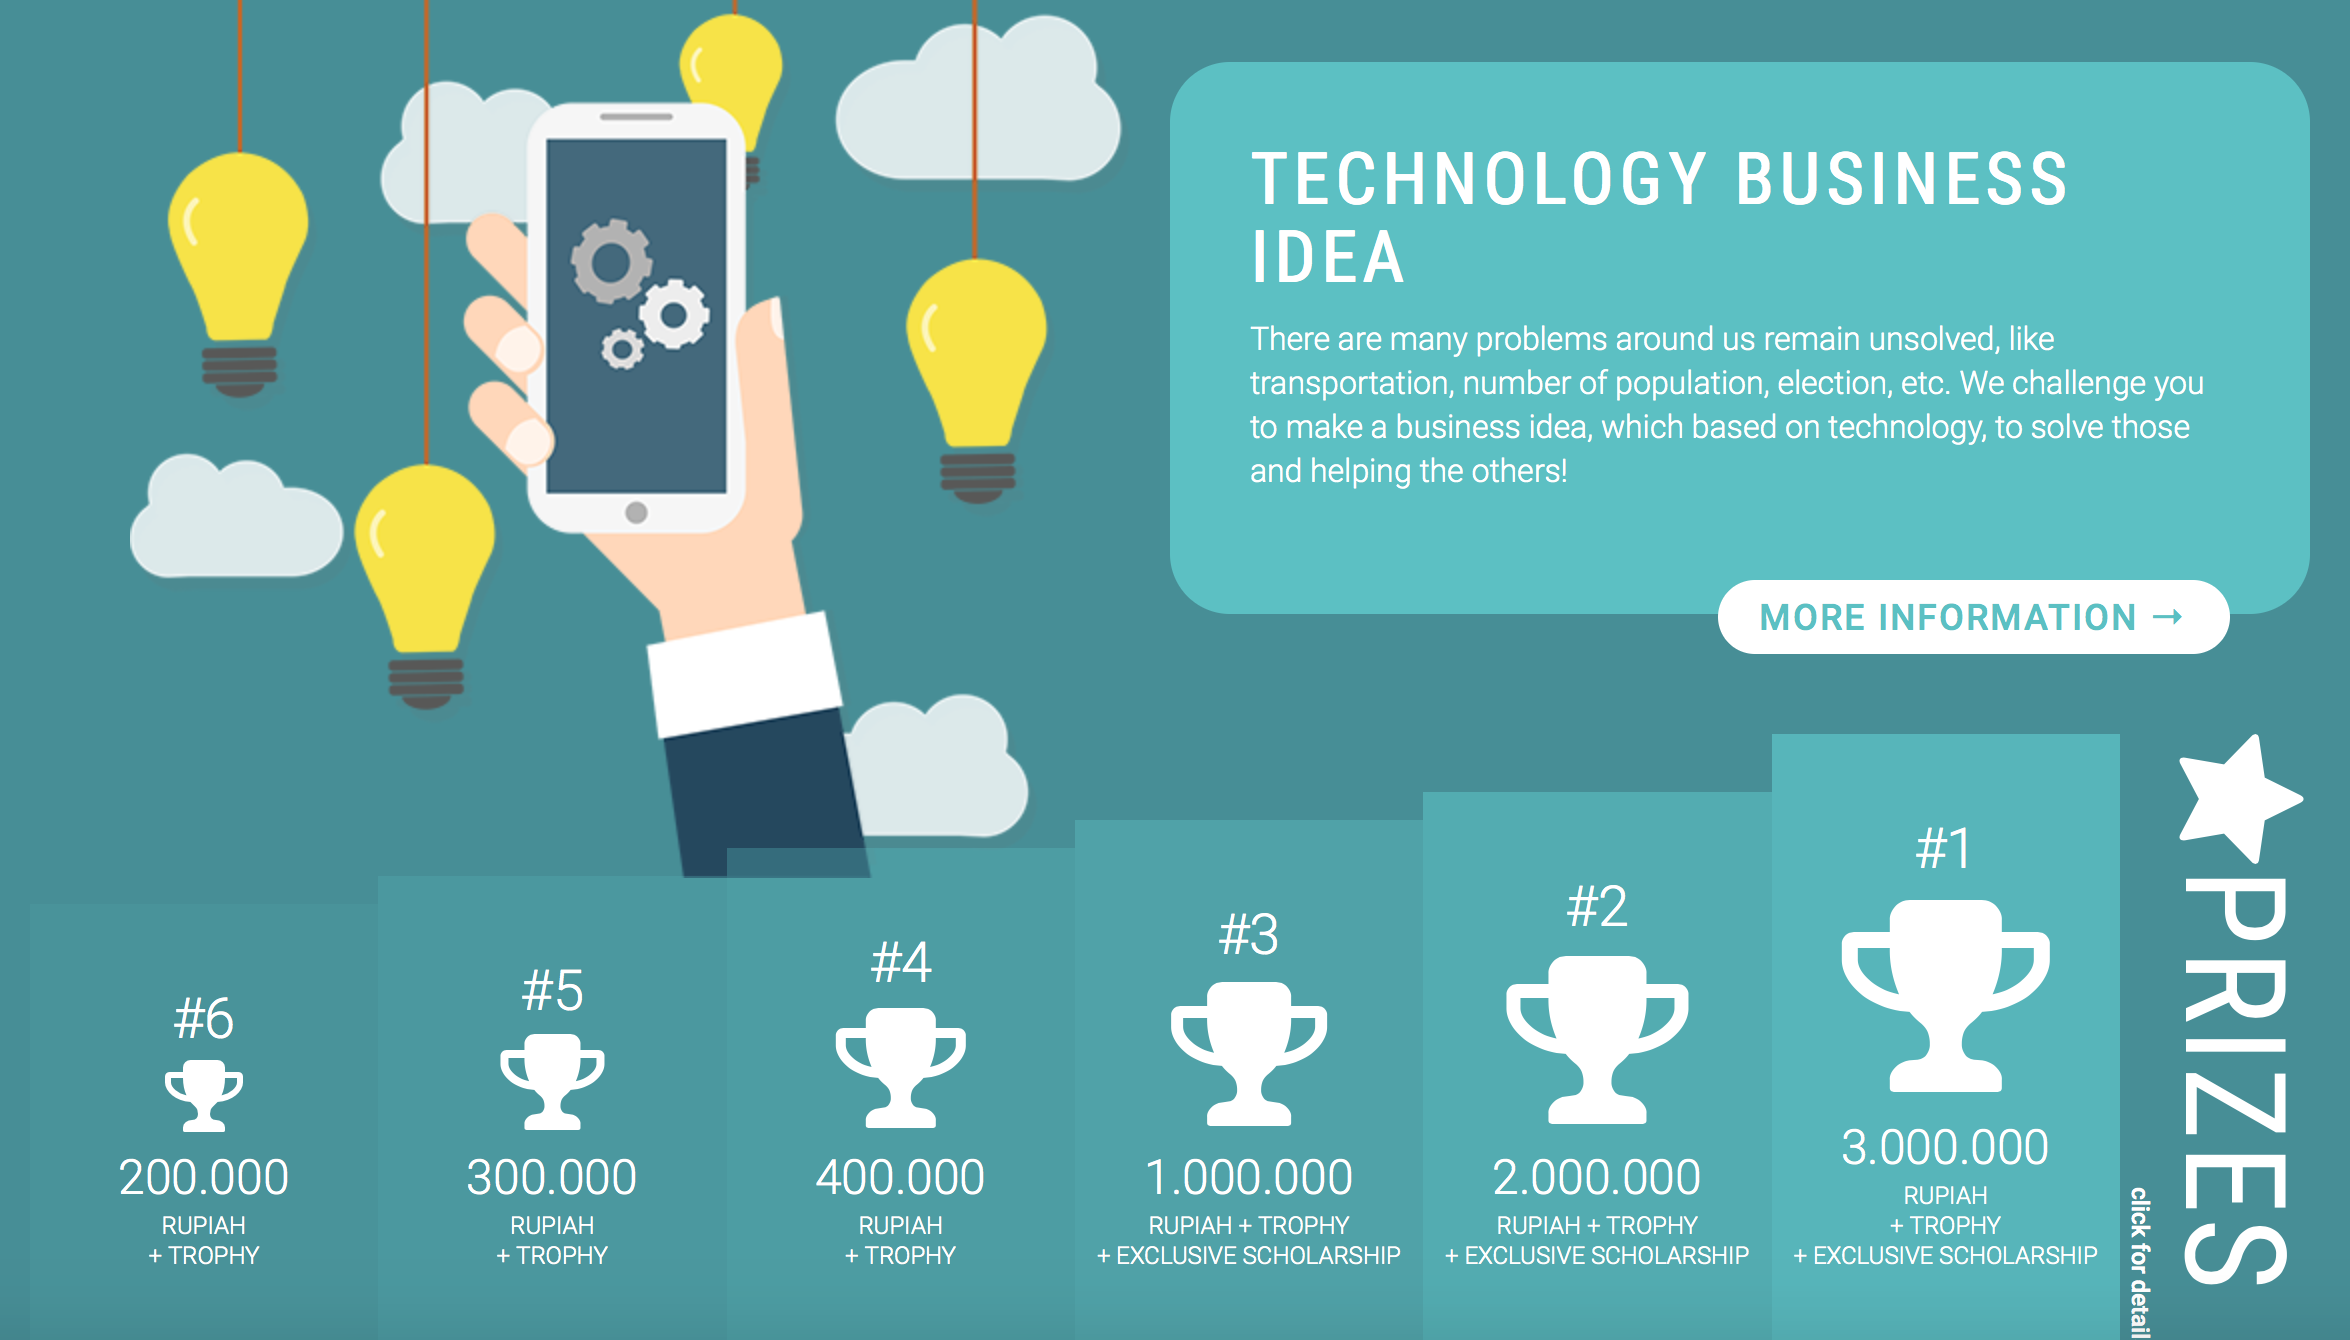 Technology Business Idea NPLC 2016